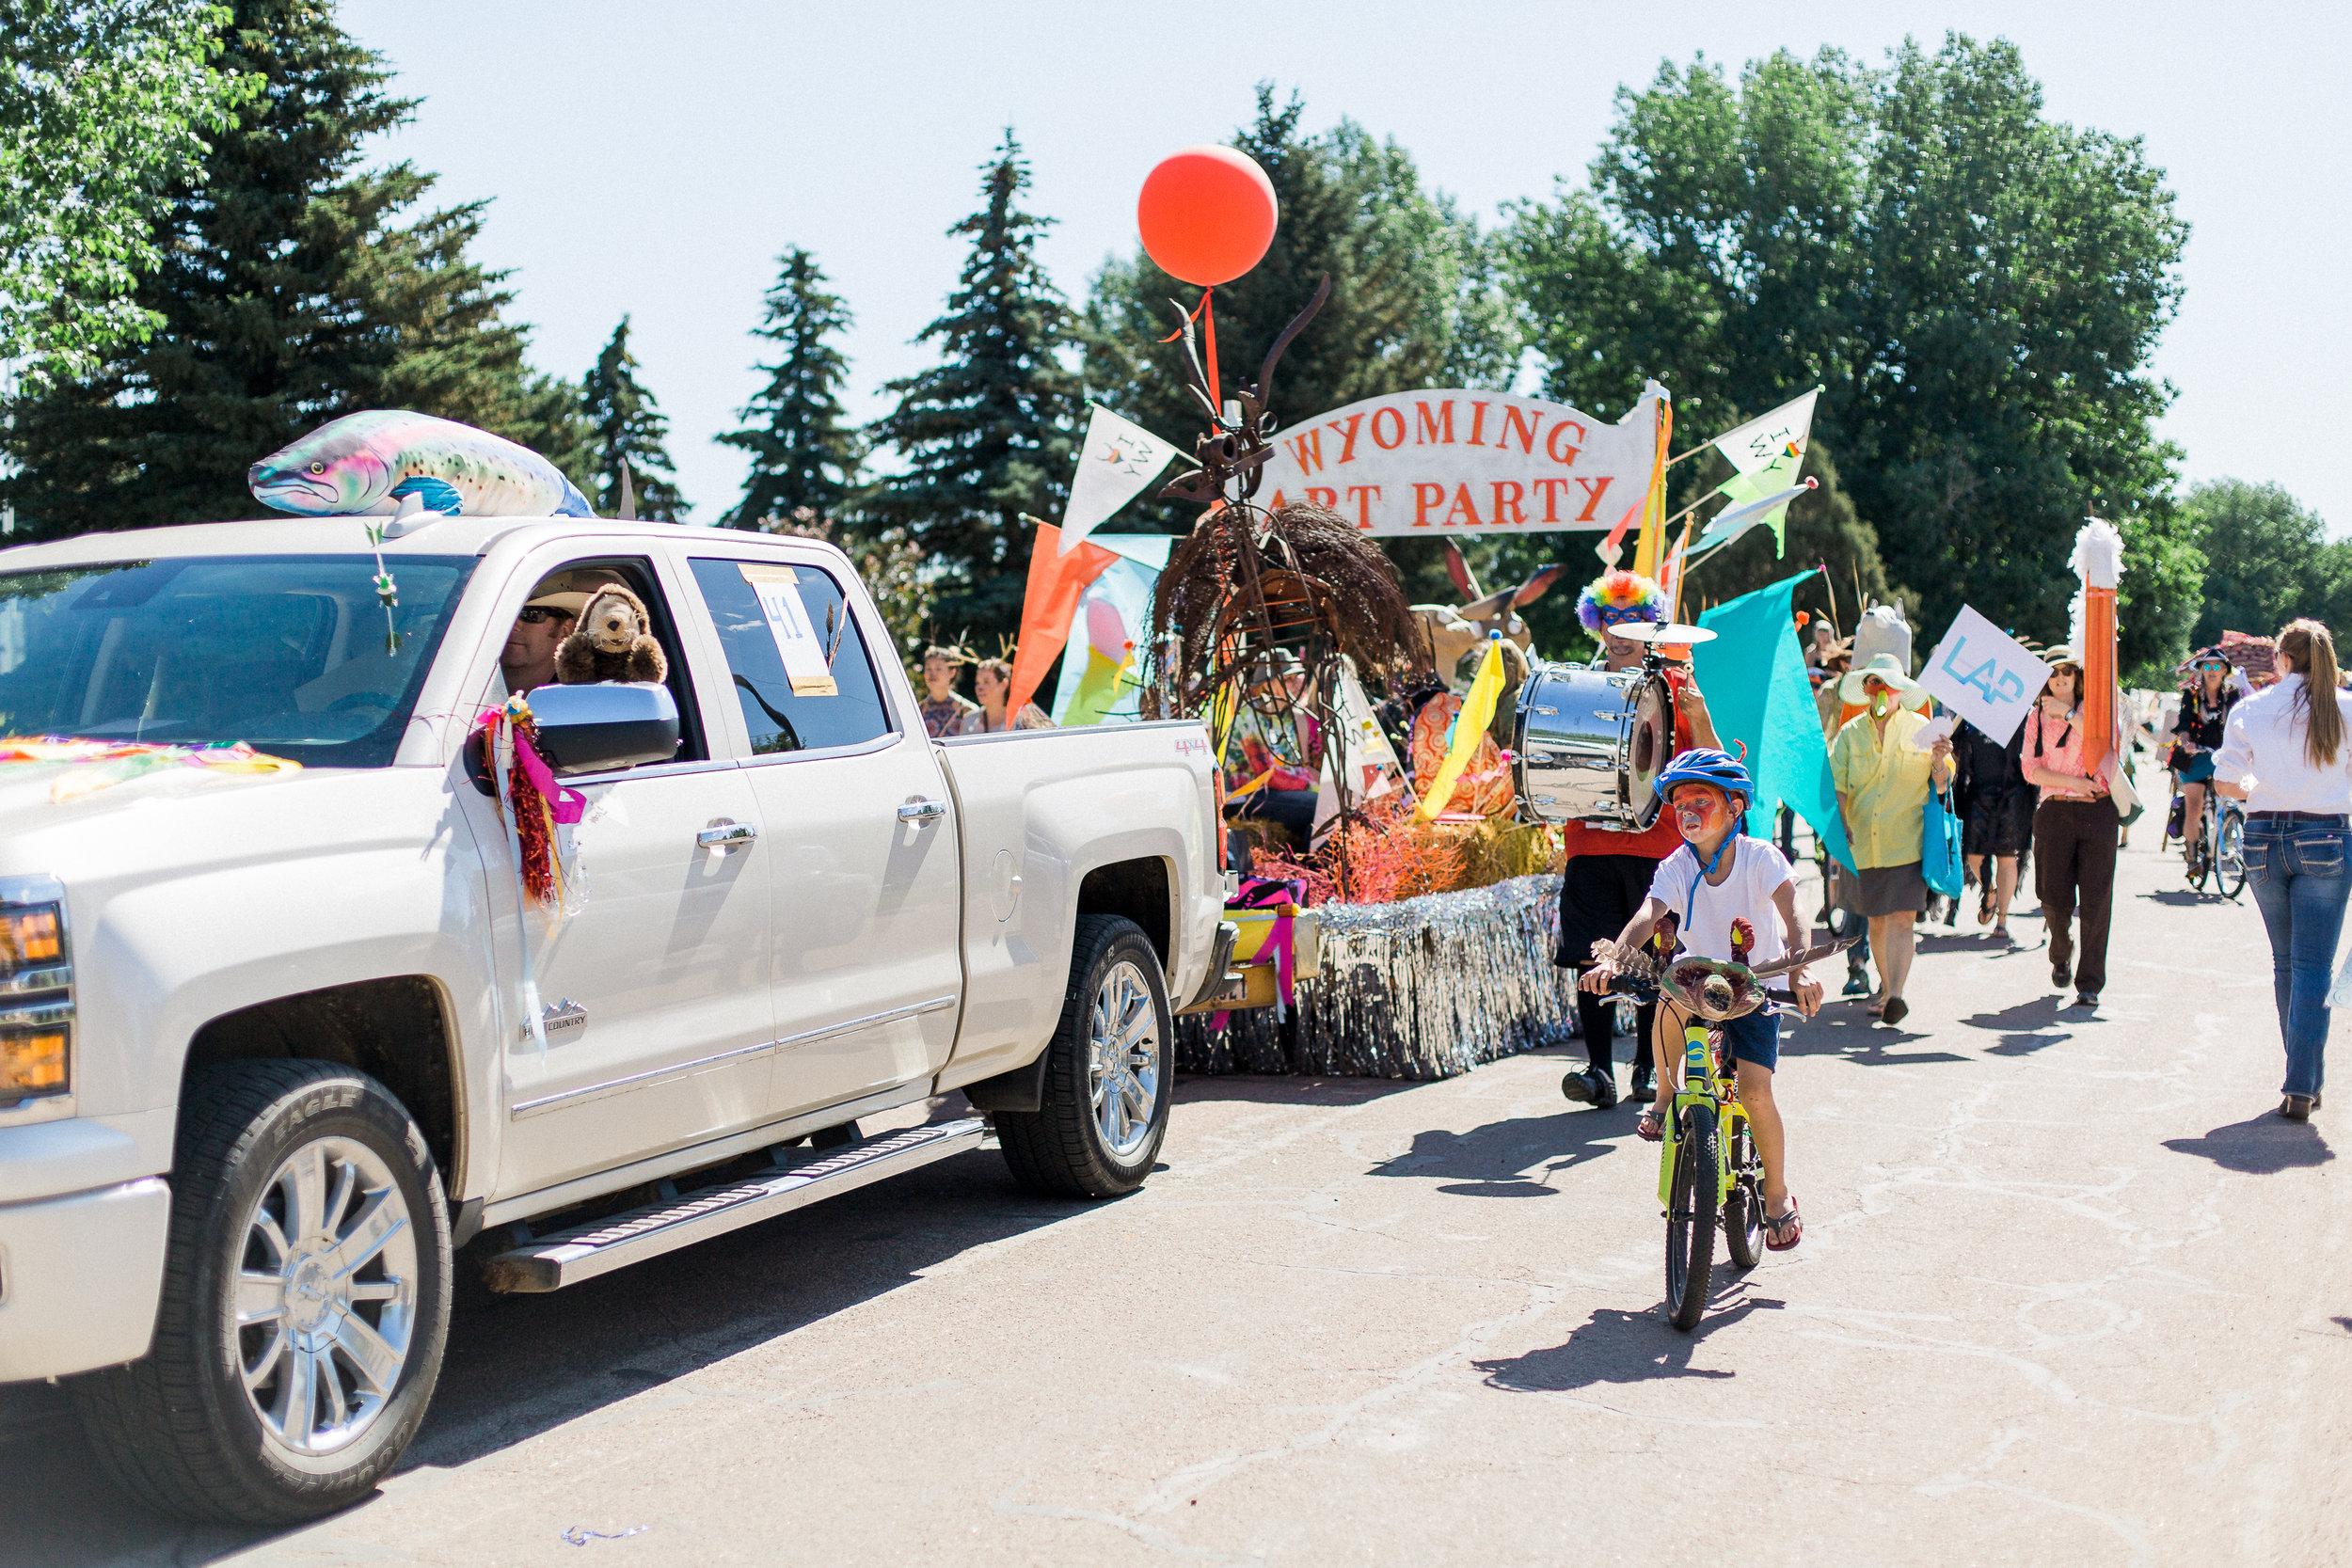 Wyoming Art Party - Parade 2016-30.jpg